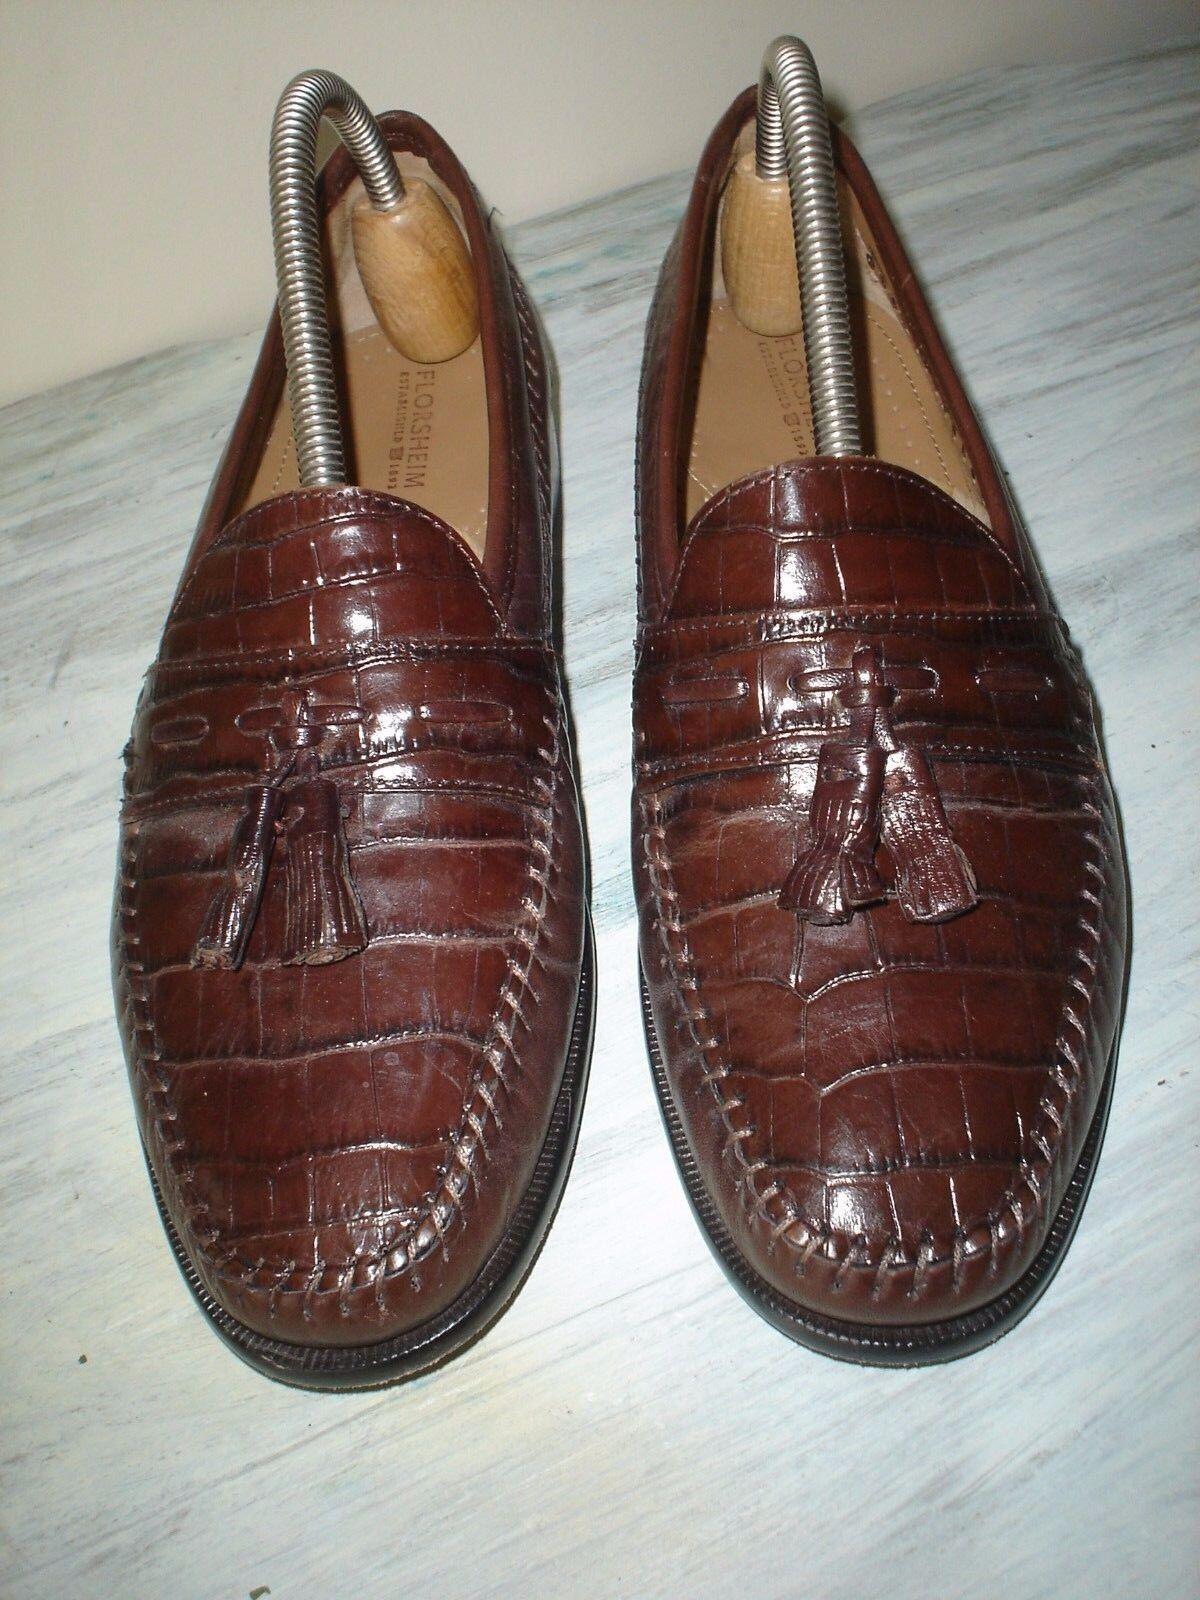 FLORSHEIM Uomo Pisa Brown Croc Pelle 8 Tassel Loafer Slip On Dress Shoes 8 Pelle D EUC a4cd9f